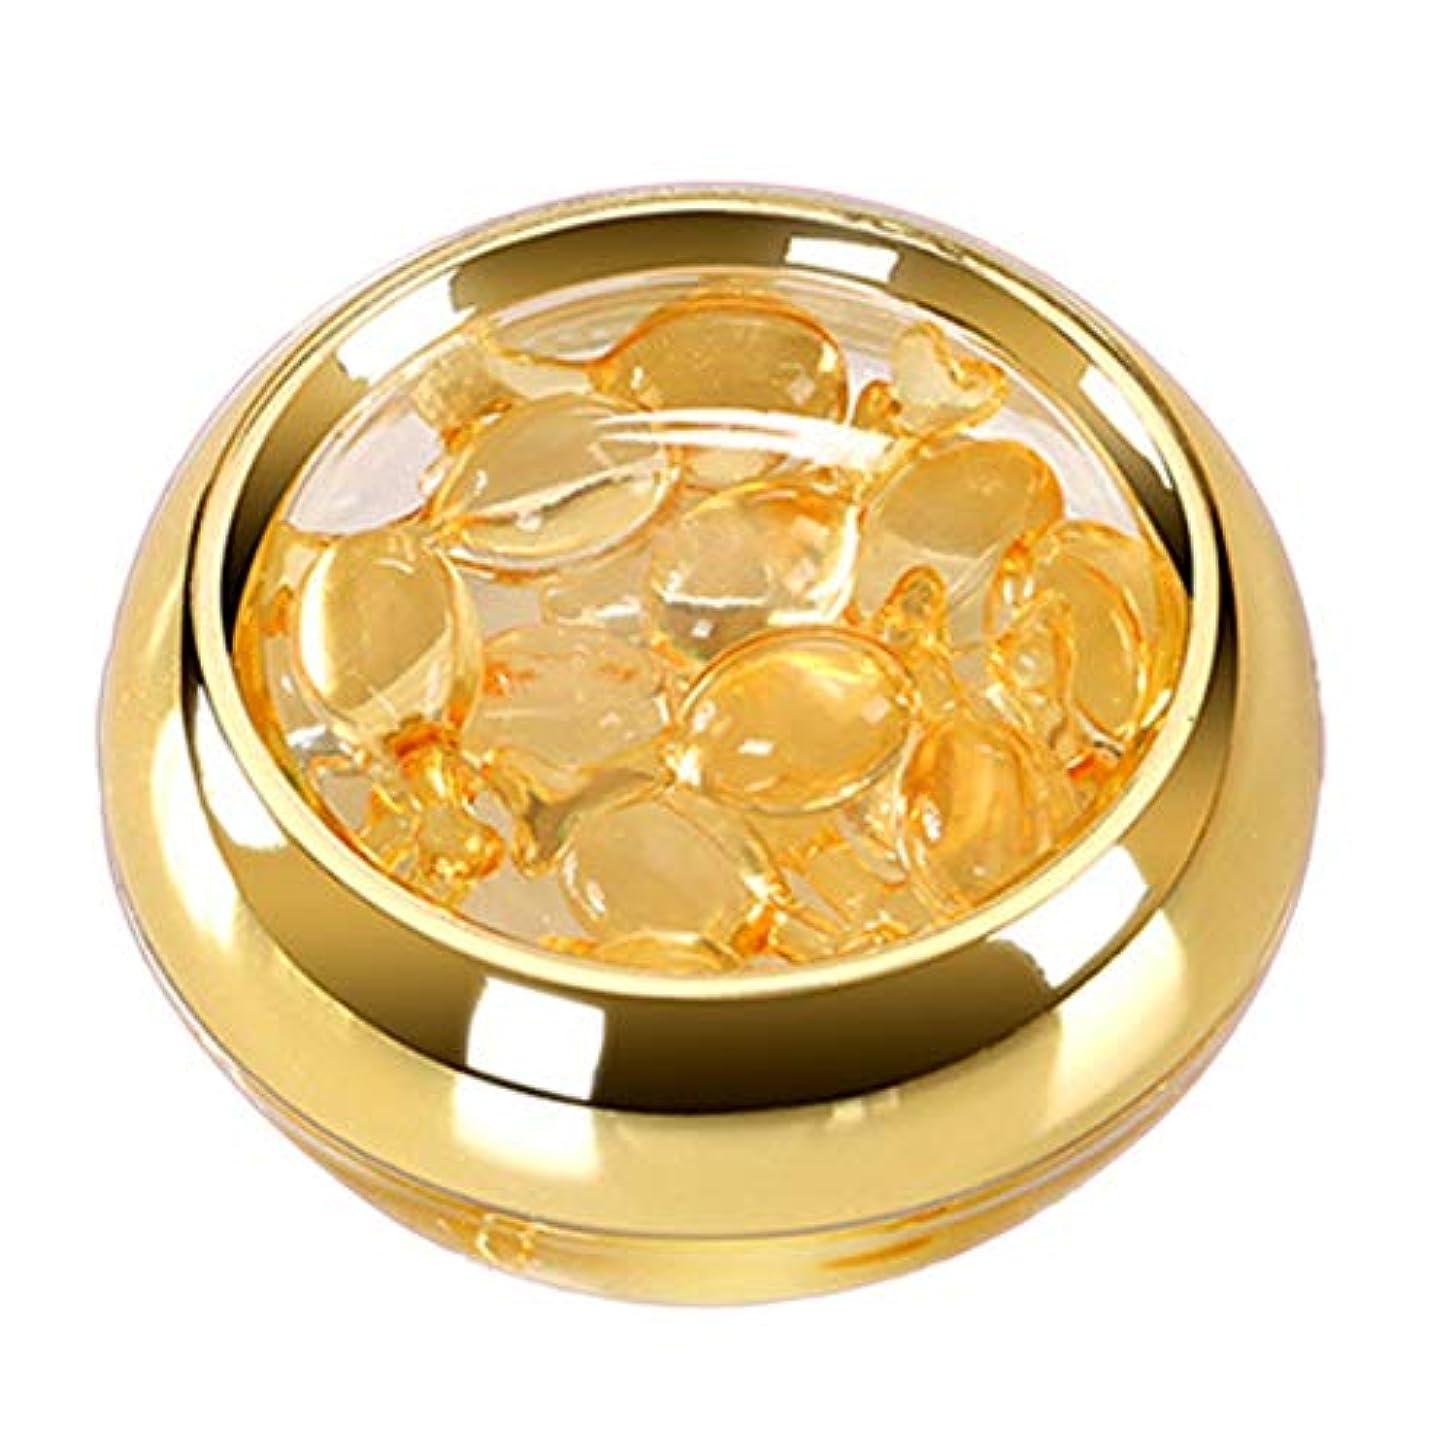 有料韻配るIntercorey Flower Moon Eye Serum Capsule Space Time Capsules Dark Circles Moisturizing Eye Cream to Eye Bags Gold